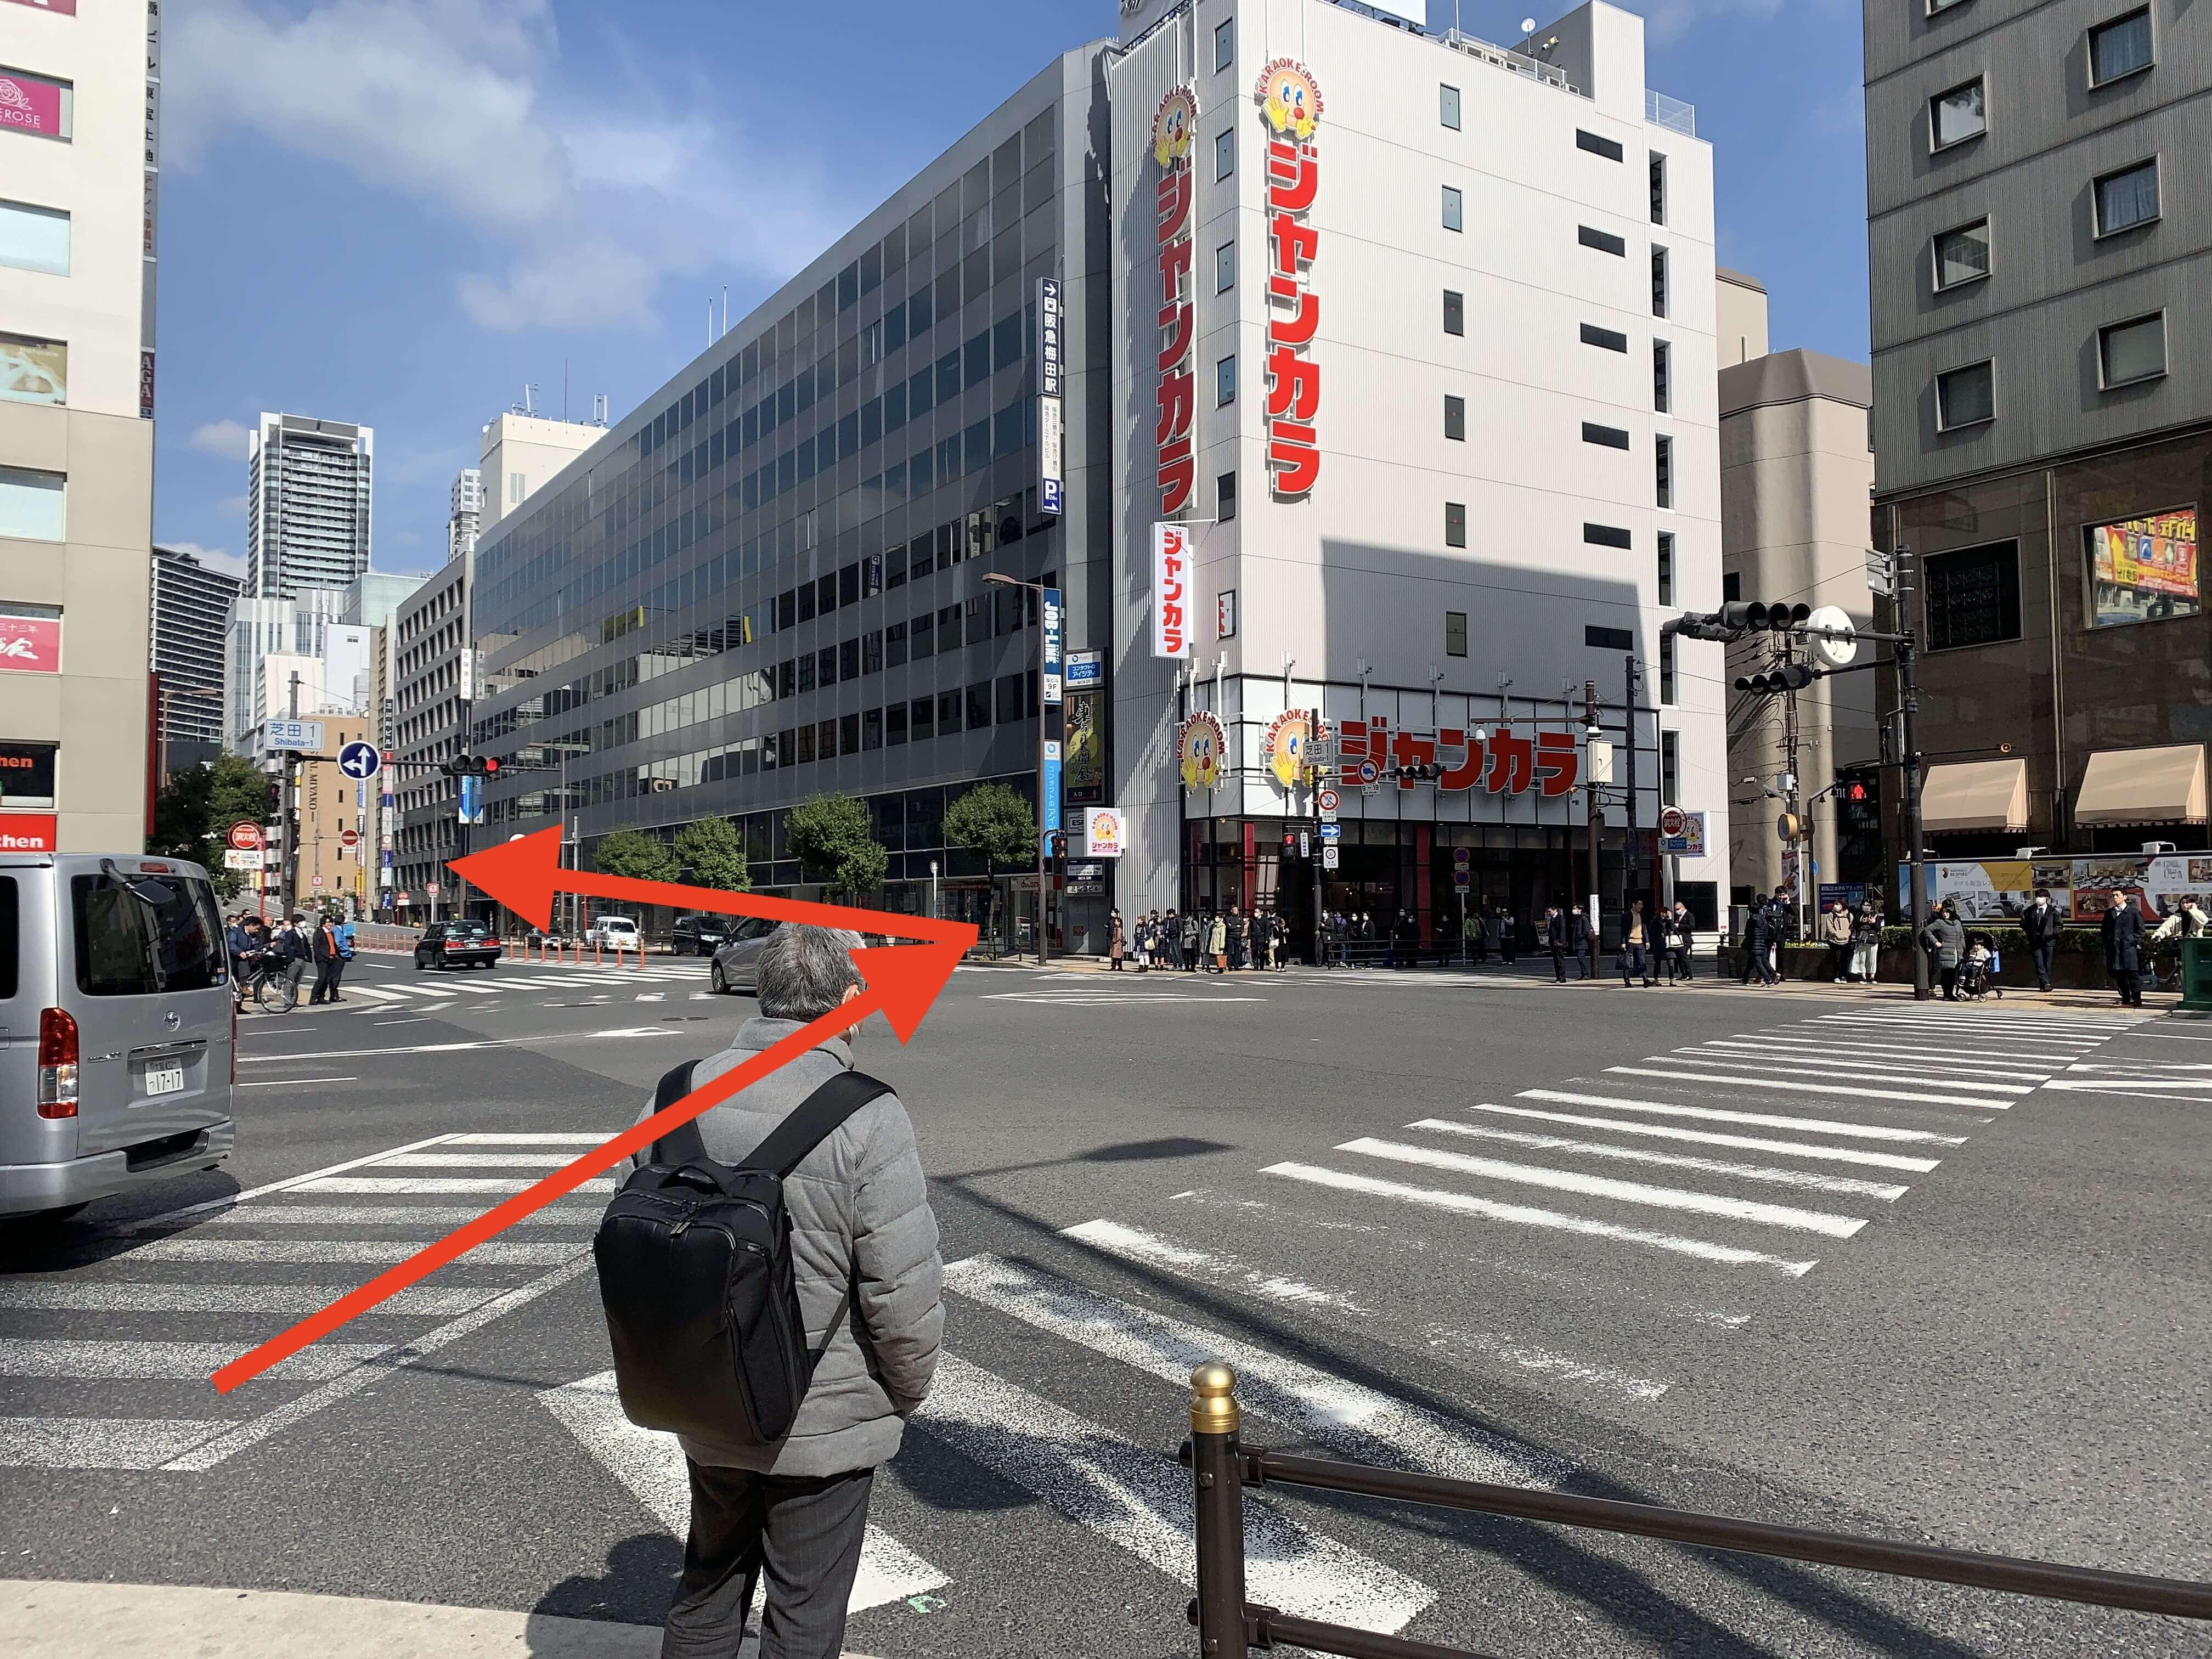 JR大阪駅・御堂筋線梅田駅から スタジオインディ大阪梅田スタジオへの アクセス5